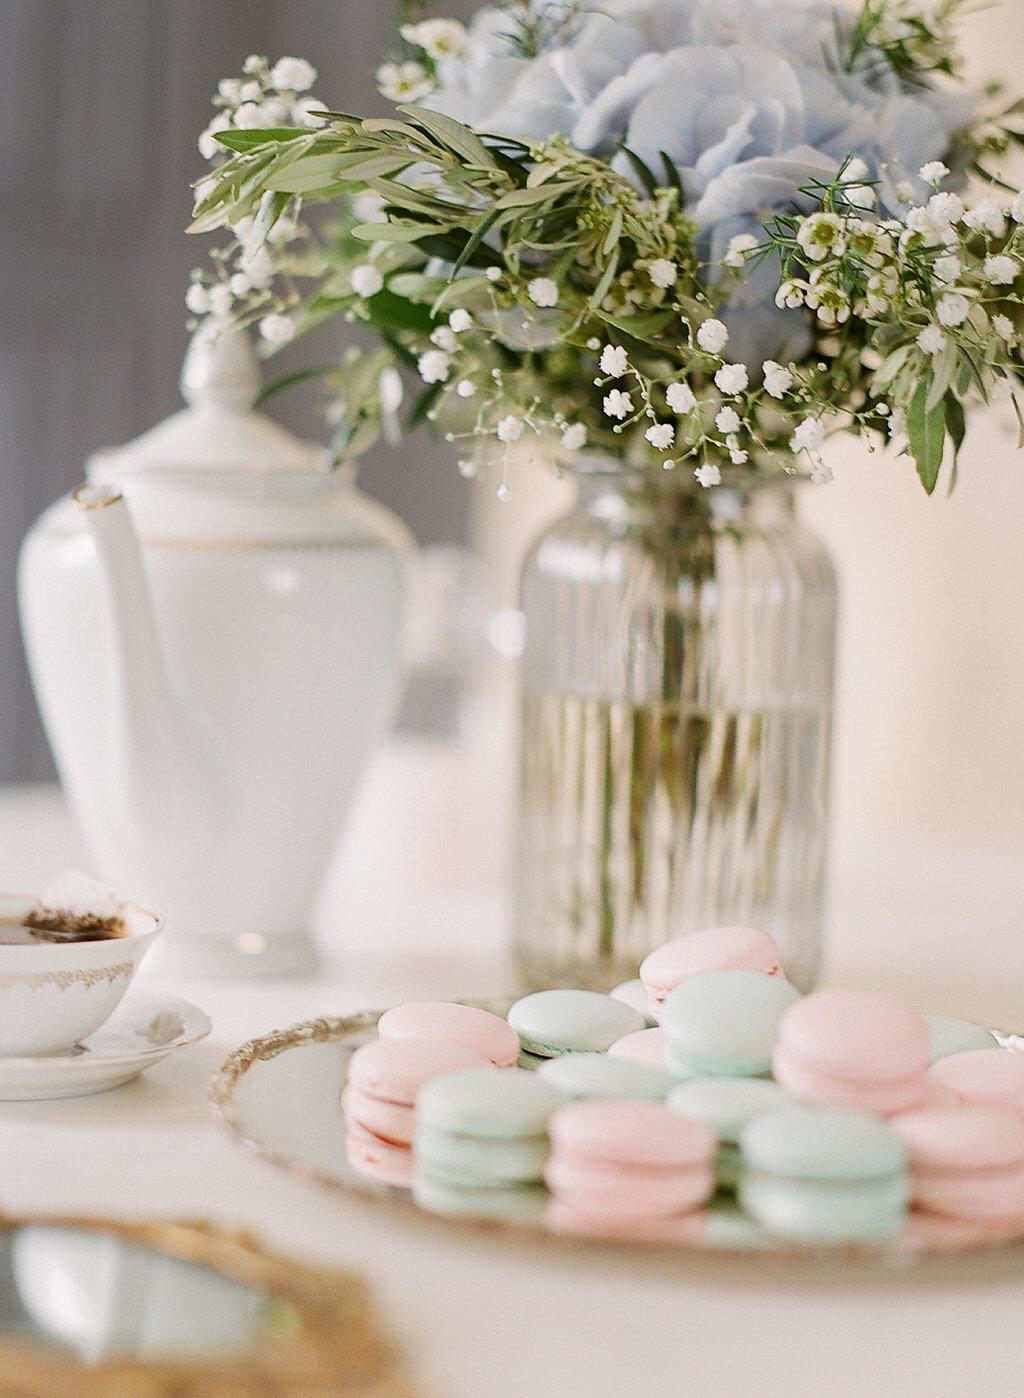 le coeur dans les etoiles - wedding planner - provence - luberon - alpilles - drome - vaucluse - sardaigne - italie - organisation - mariage - shooting - dolce vita - valery villard-28